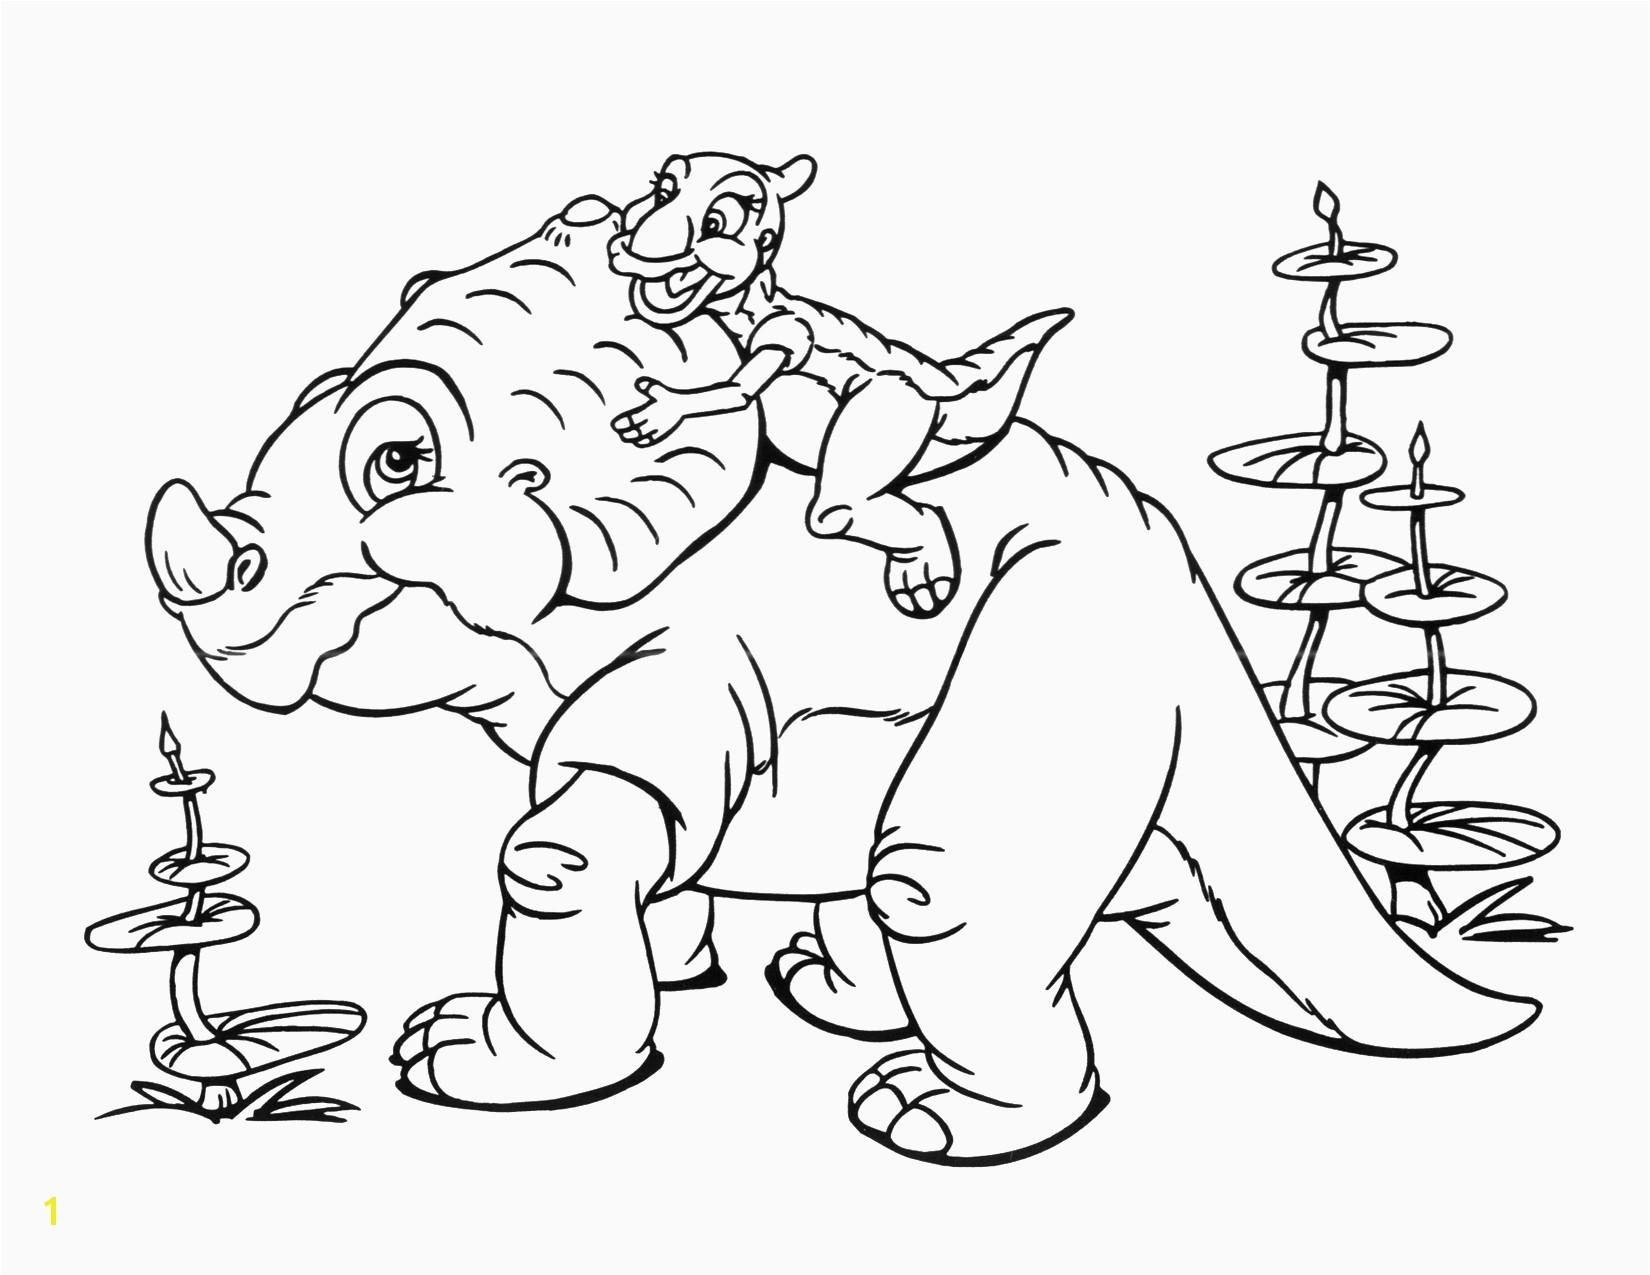 Baby Coloring Pages New Media Cache Ec0 Pinimg originals 2b 06 0d coloring book